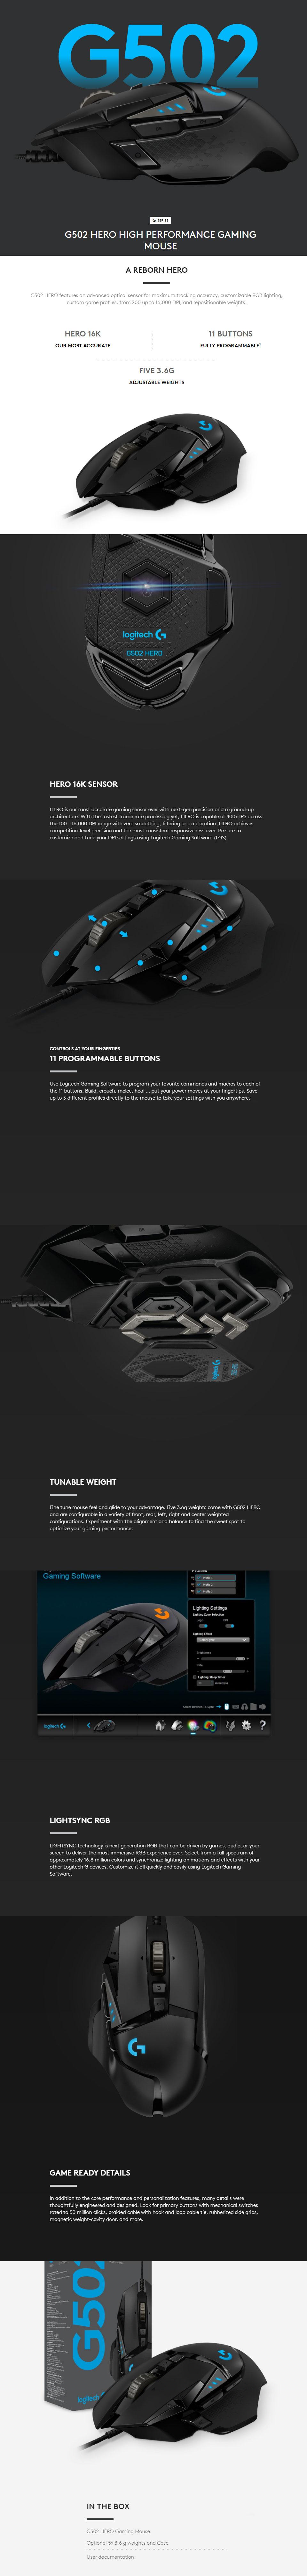 Logitech G502 Hero RGB Gaming Mouse with 16K Sensor